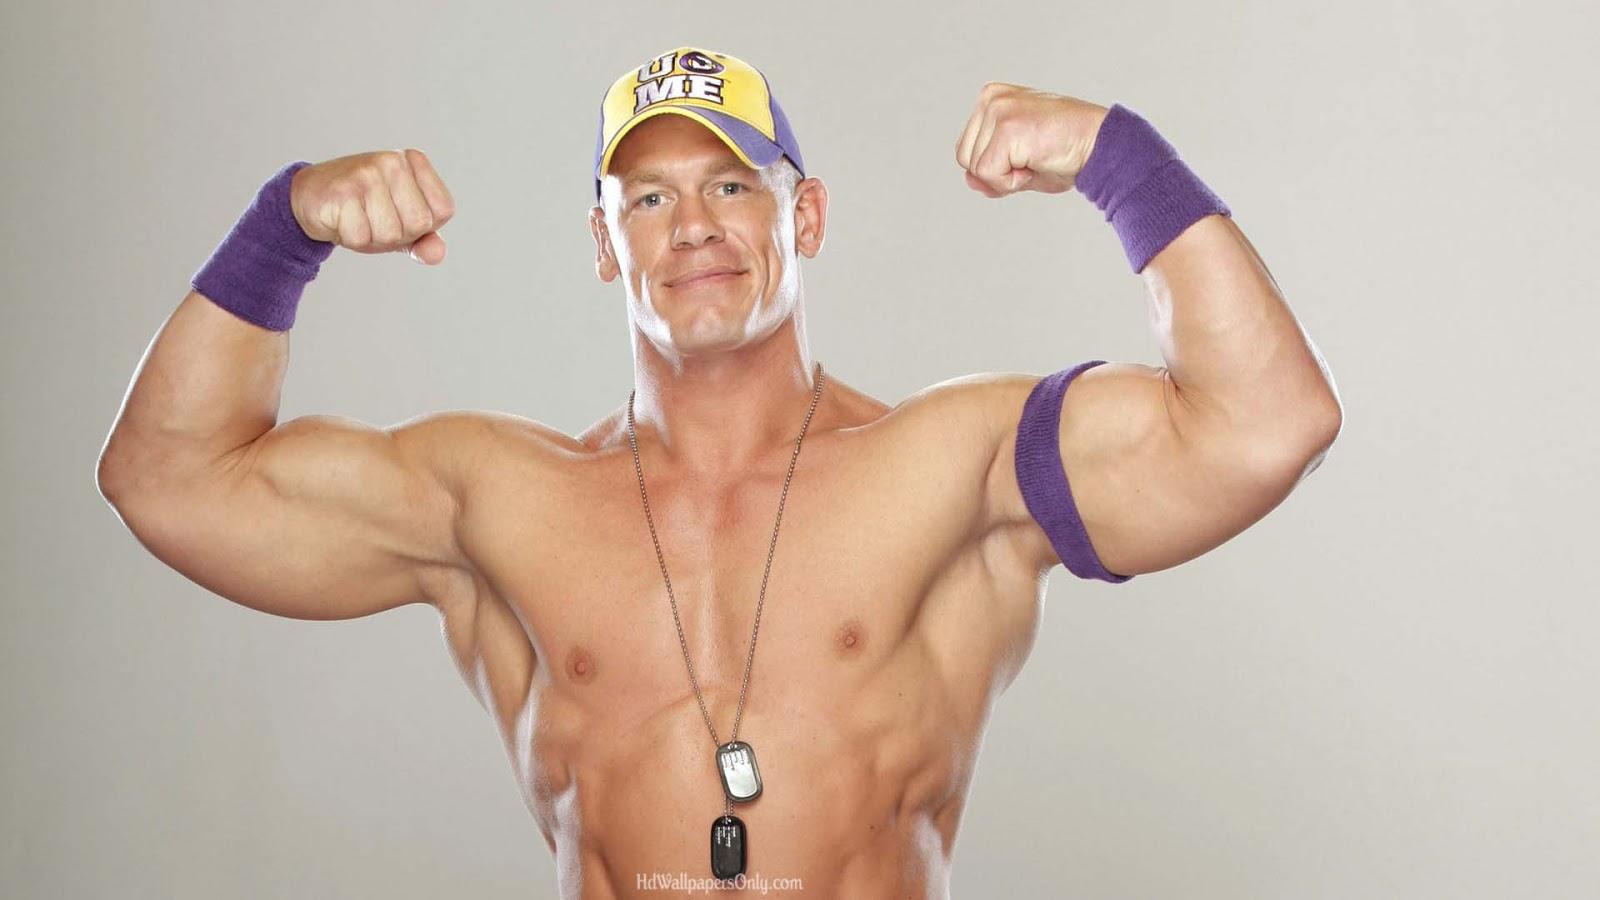 John Cena 1080p HD Wallpapers